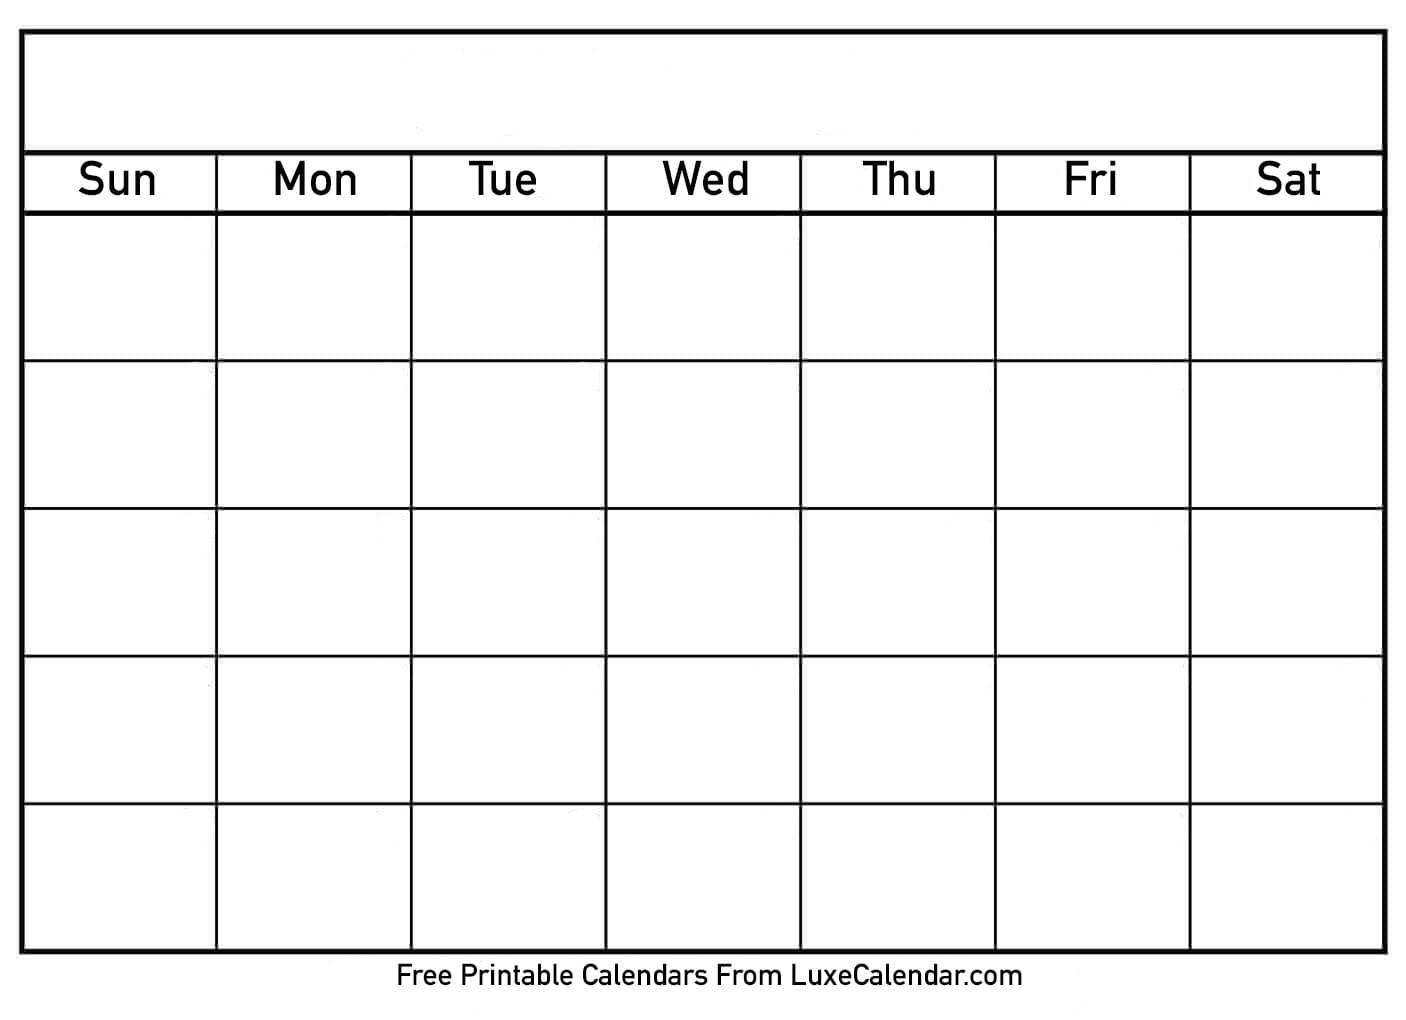 Blank Printable Calendar - Luxe Calendar inside Fill In Calendar Template Printable